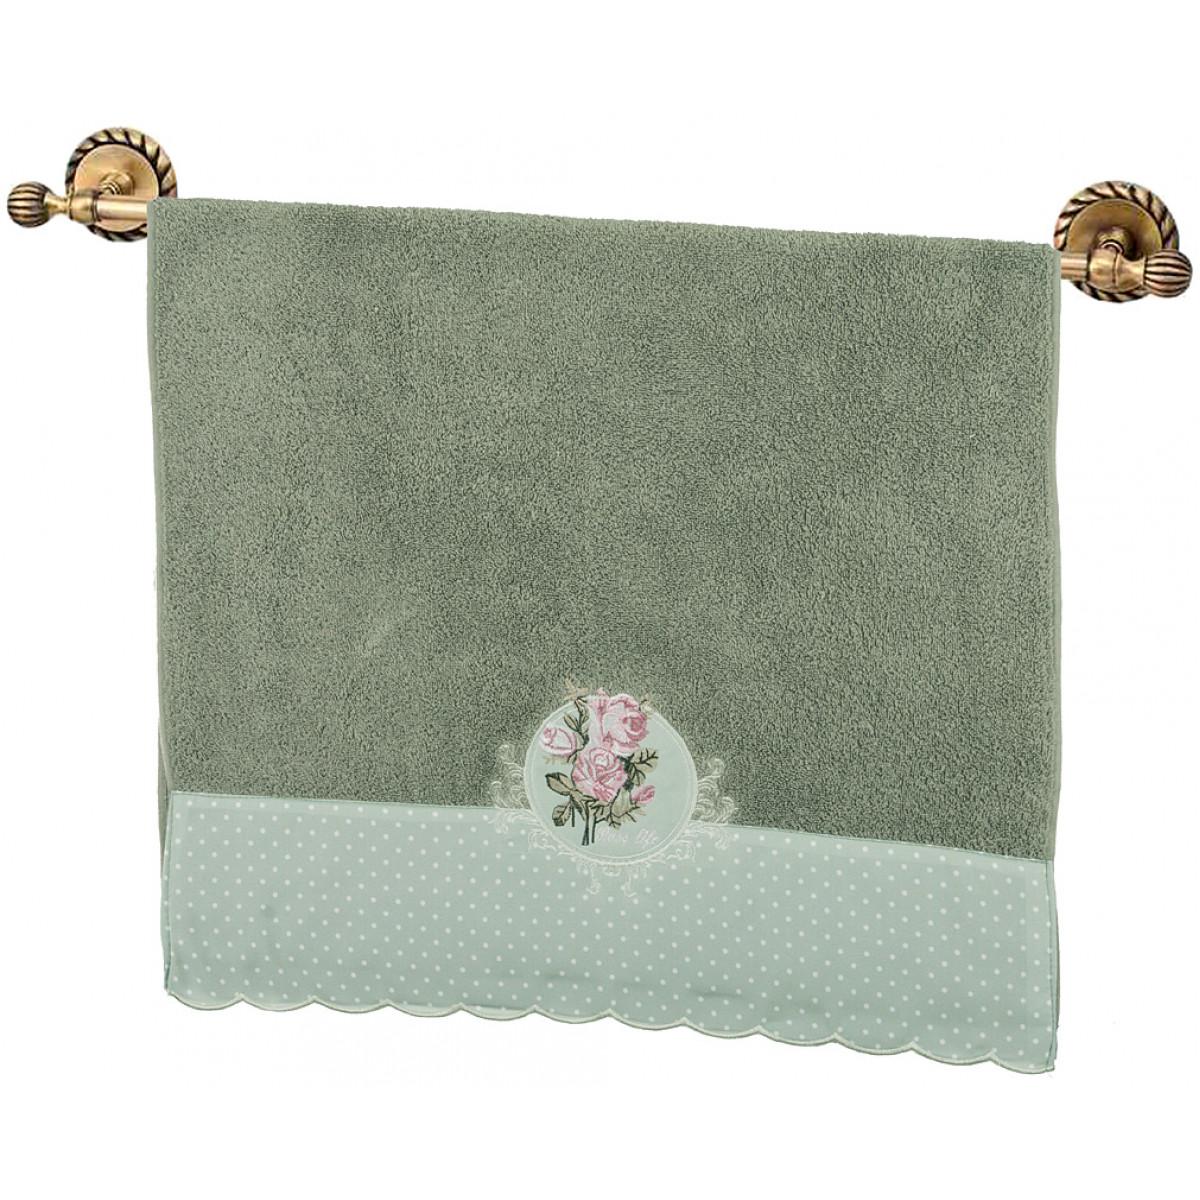 Полотенца Santalino Полотенце Hellen (70х140 см) полотенца tango полотенце stevania 70х140 см